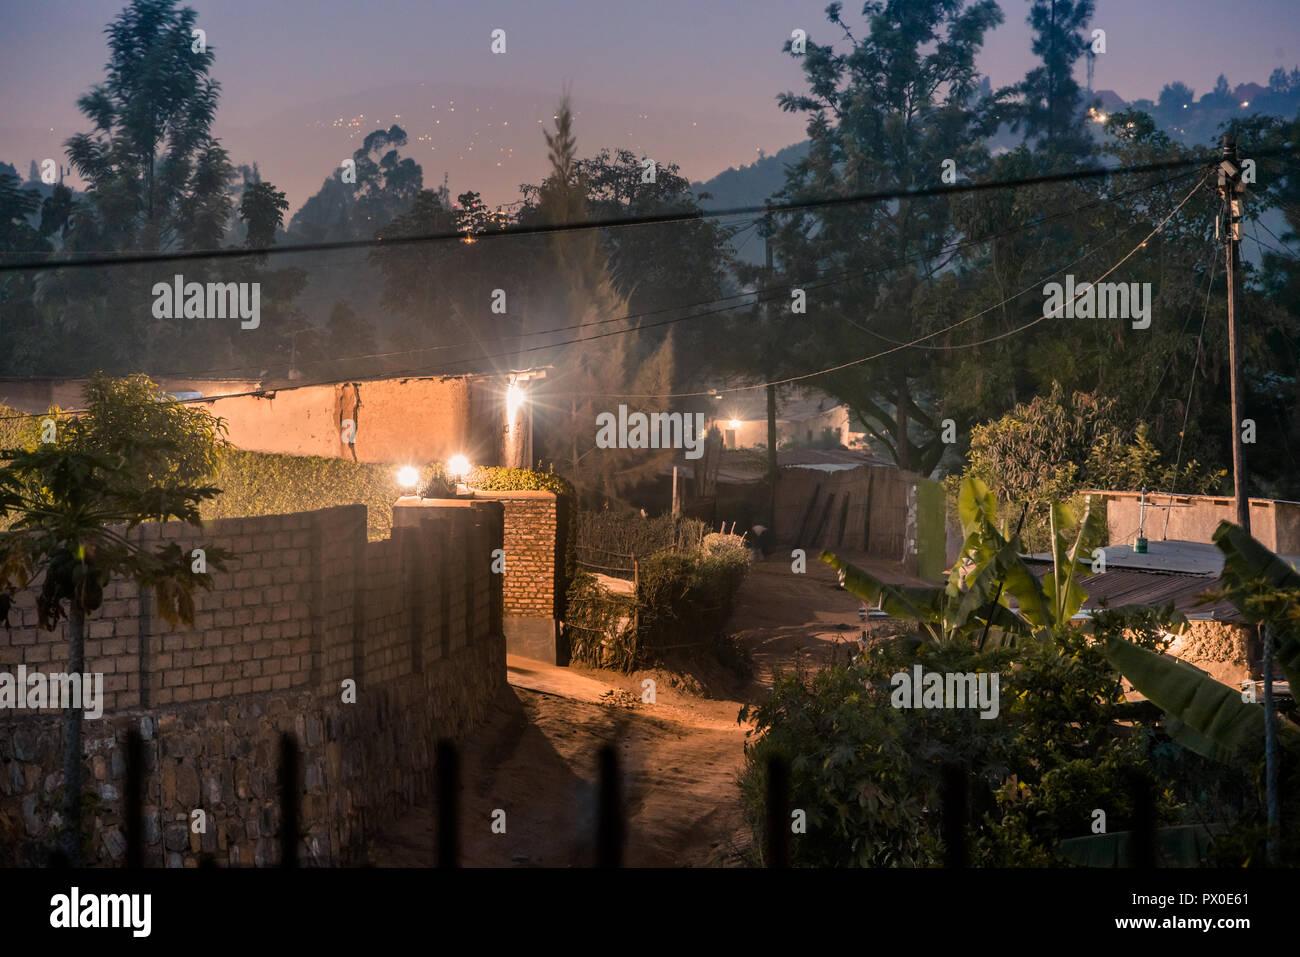 Dimly lit street scene among houses in Nyamirambo, an outlying suburb of Kigali - Stock Image